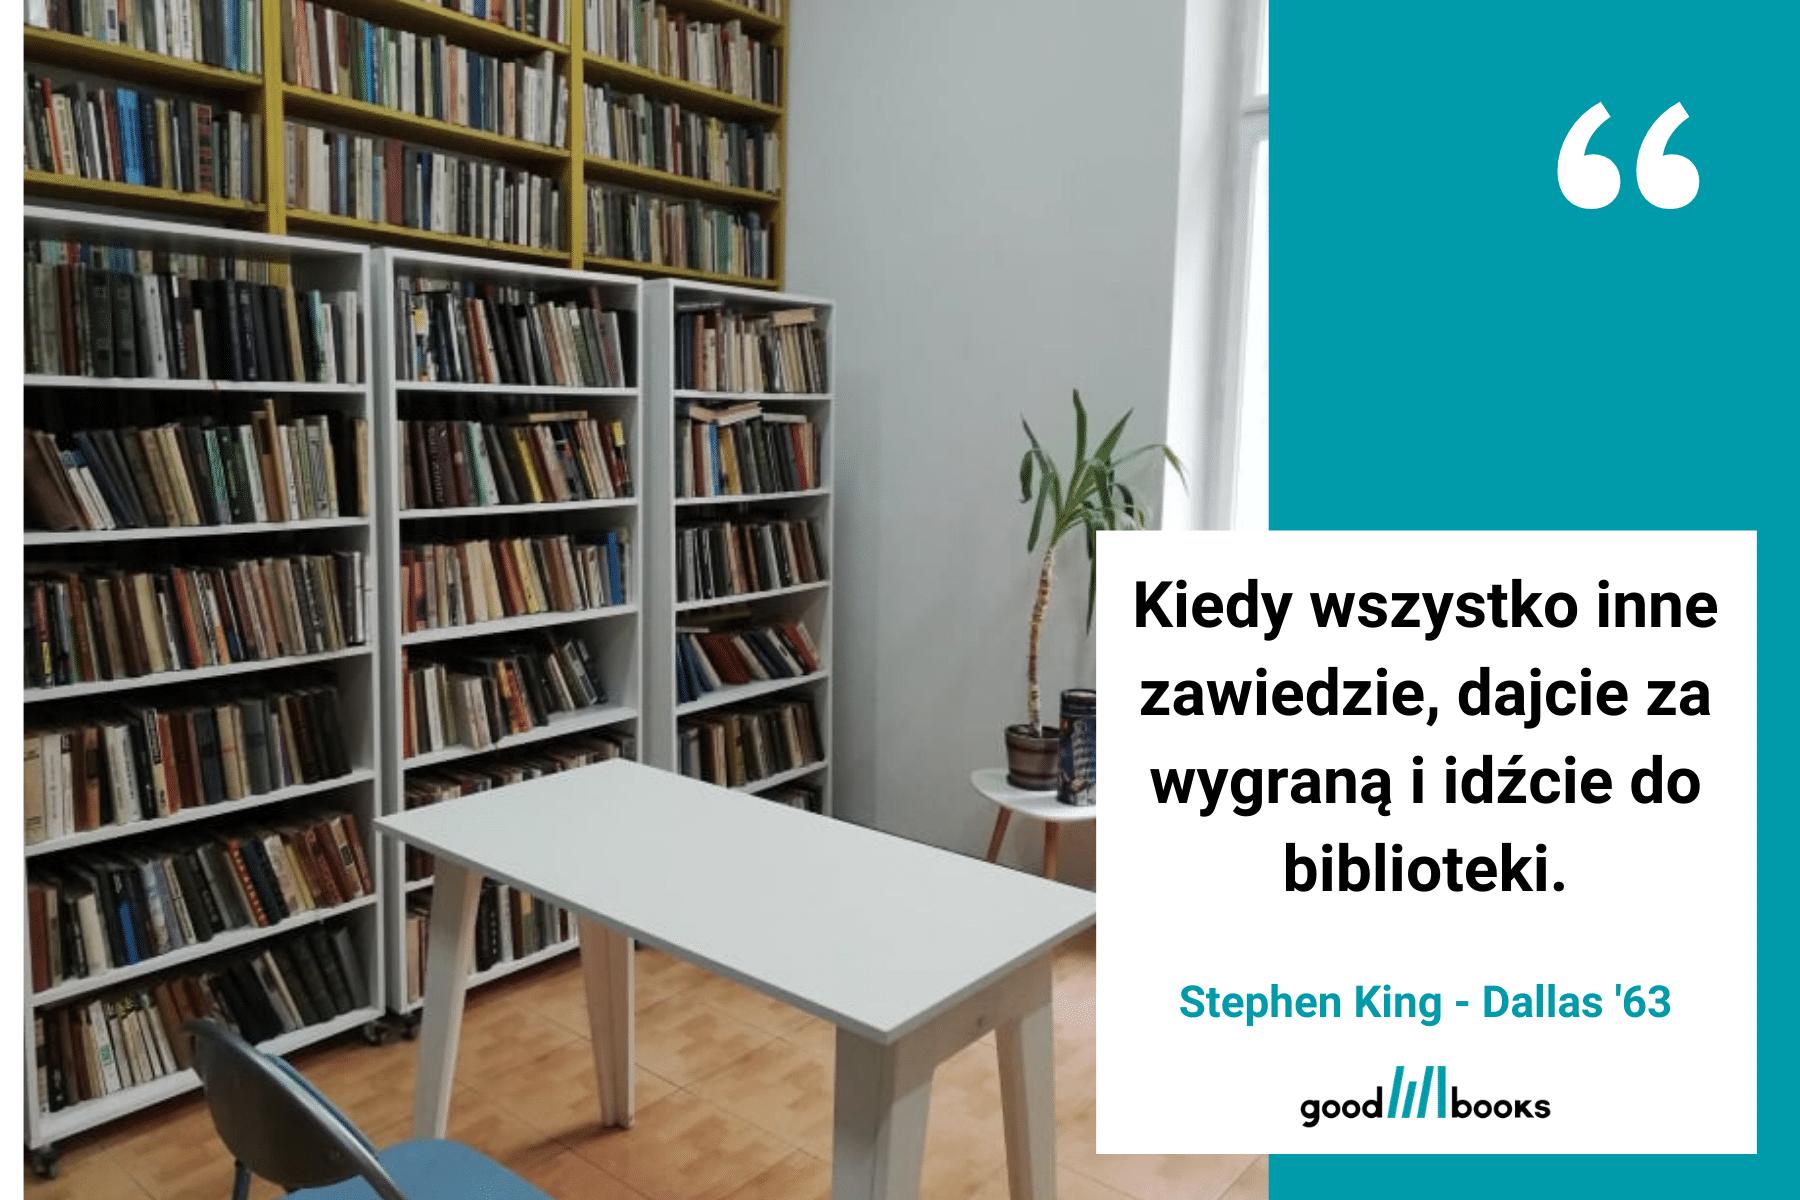 Cytat o bibliotece Goodbooksowe memy.